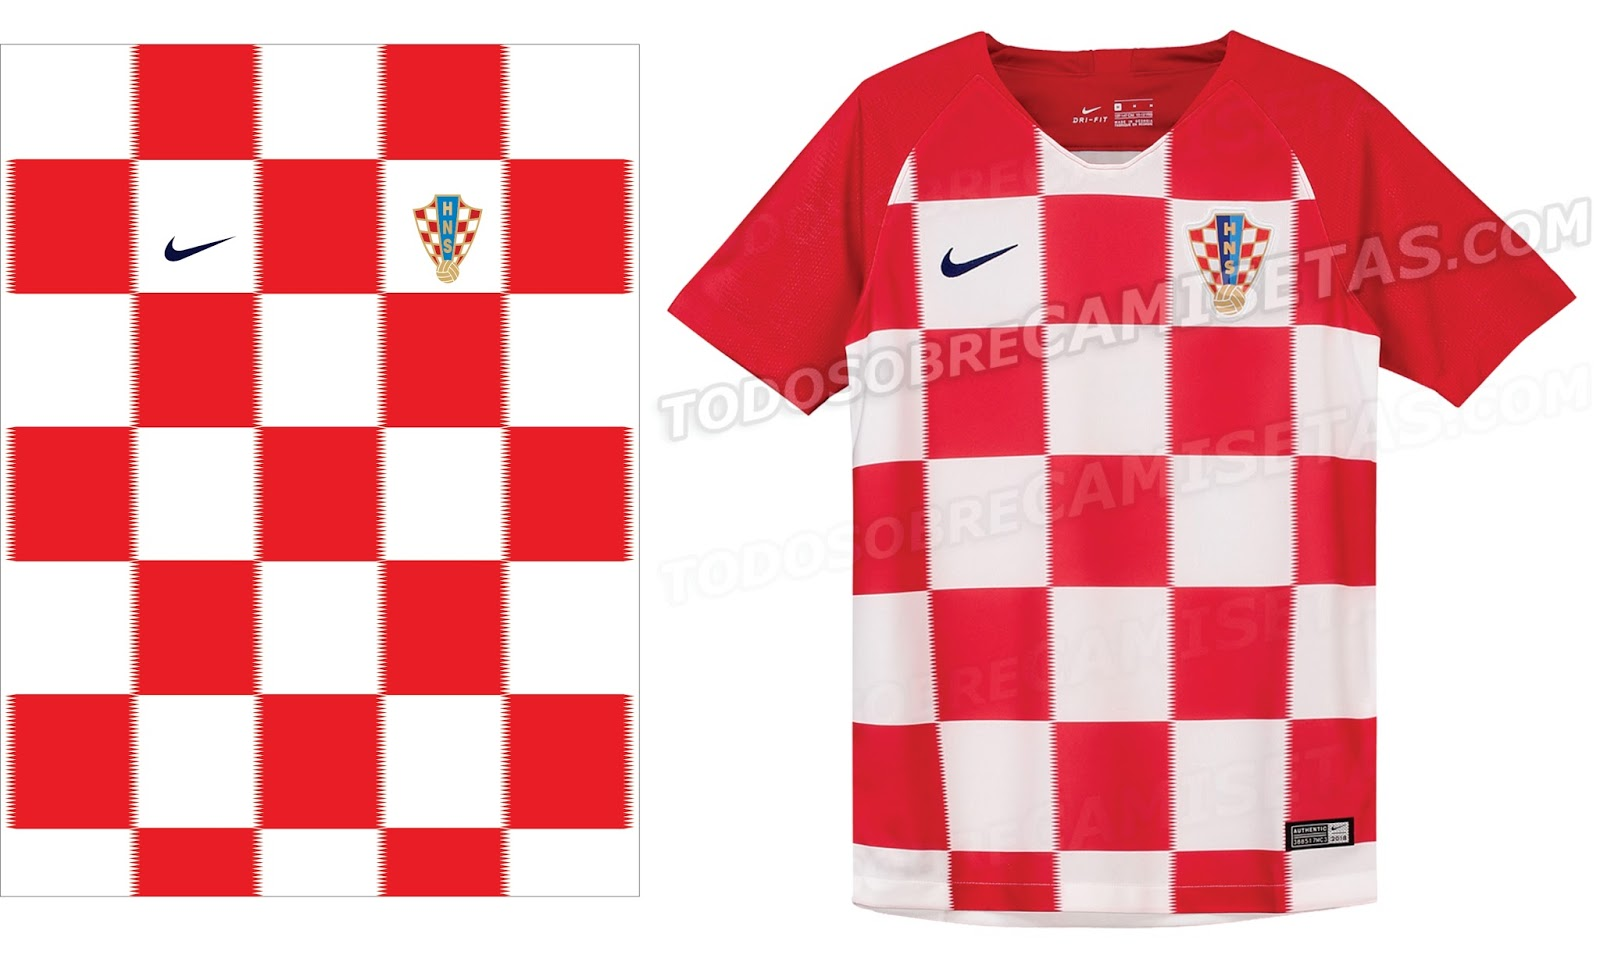 (Busqueda) Kit de croacia Croatia%2B2018%2BWorld%2BCup%2BKits%2BLEAKED